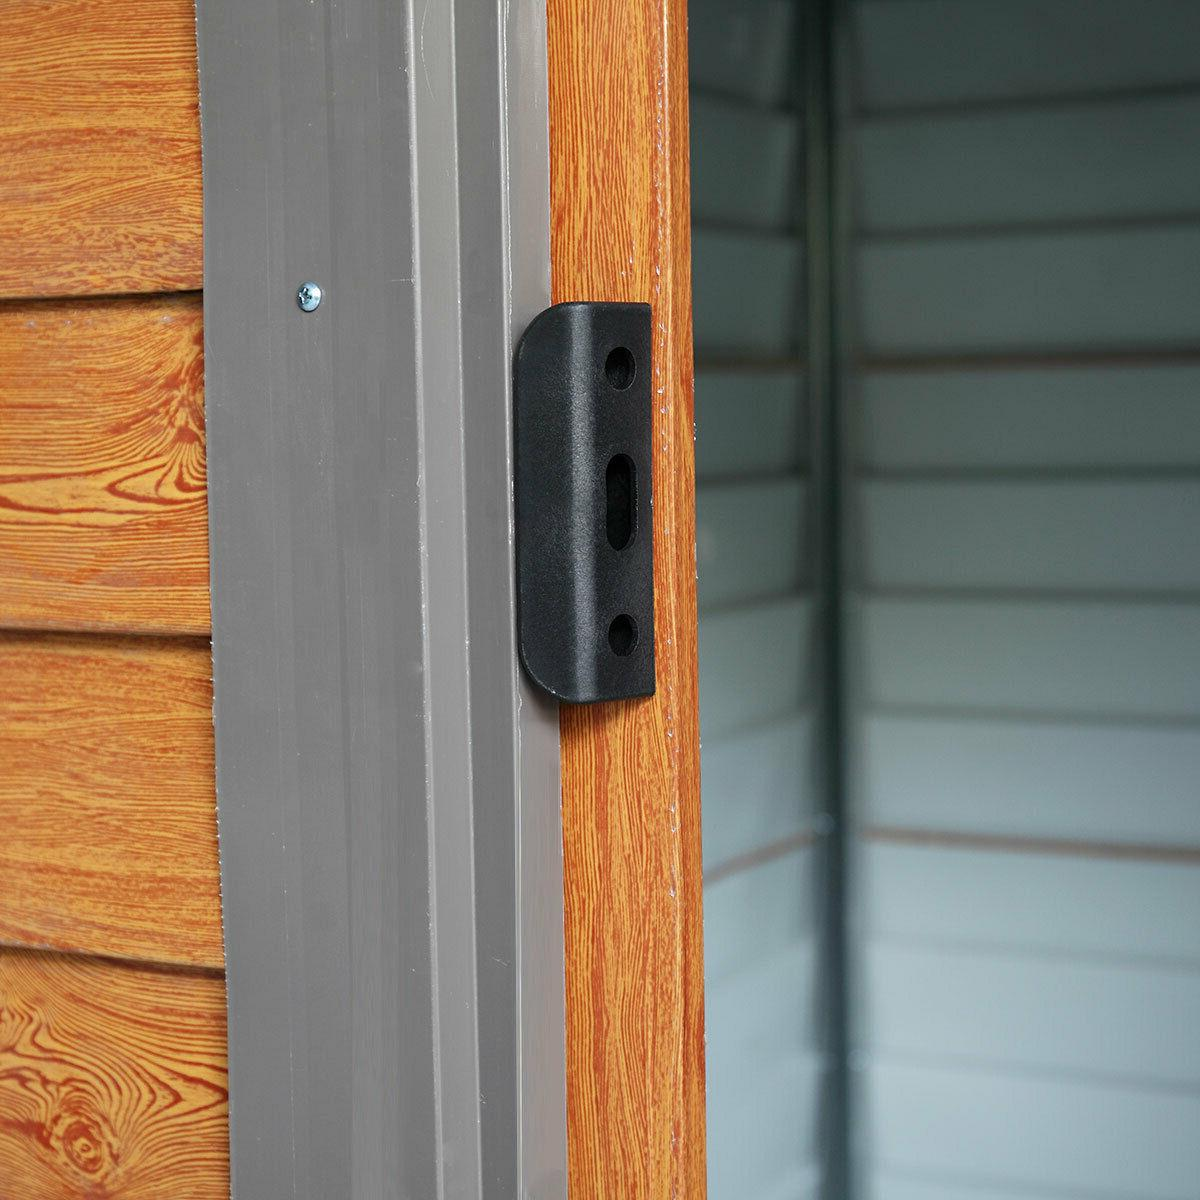 5x6 Outdoor Storage Shed House Sliding Door